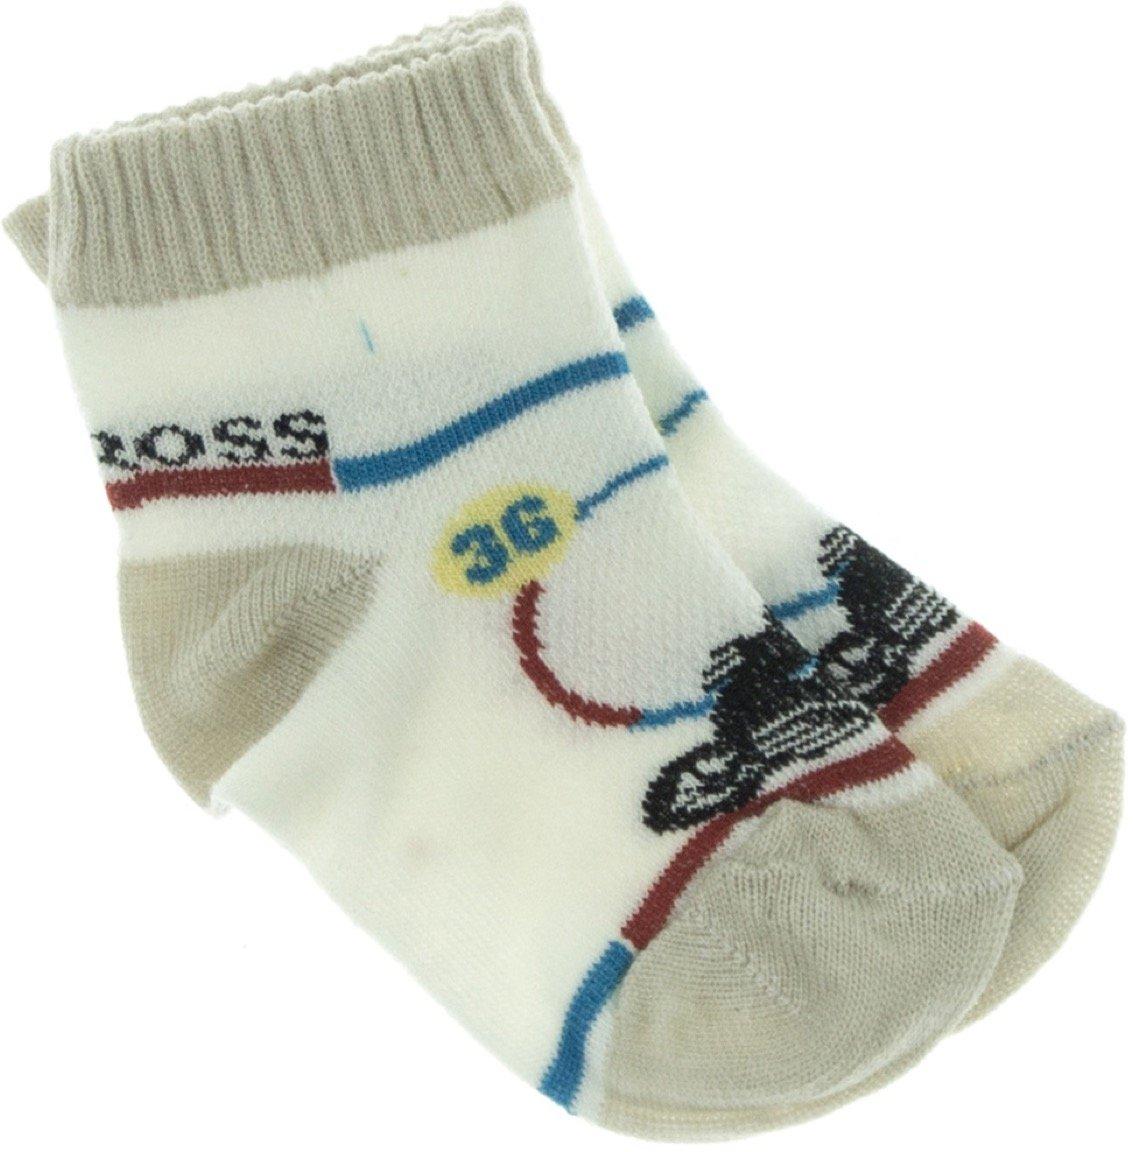 Bella Calze παιδικές κάλτσες «The Motocross»